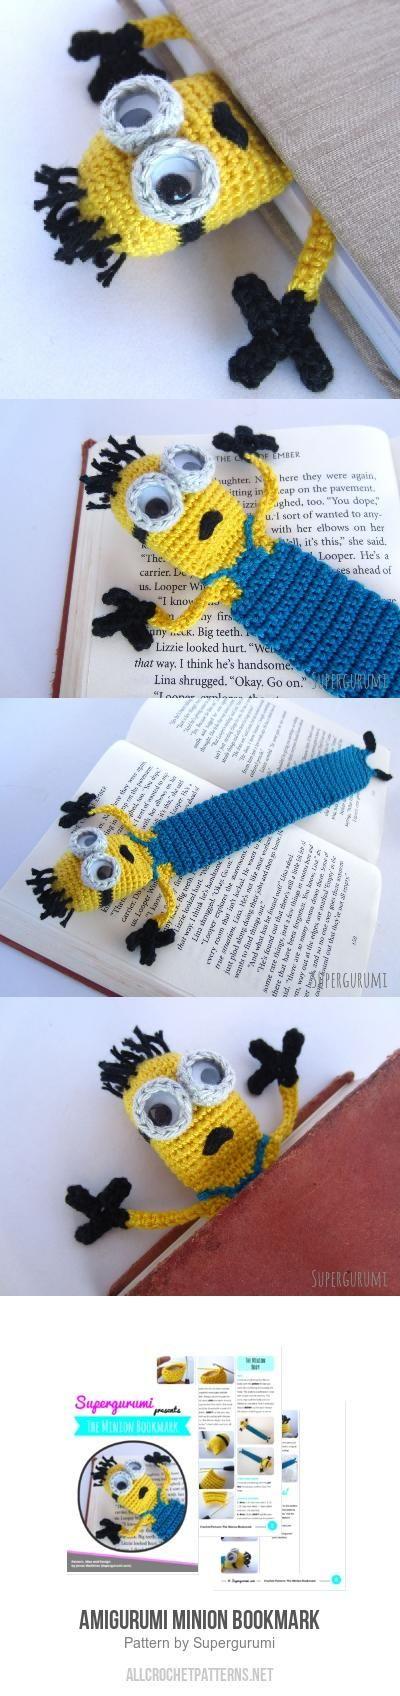 Amigurumi Minion Bookmark crochet pattern by Supergurumi ...